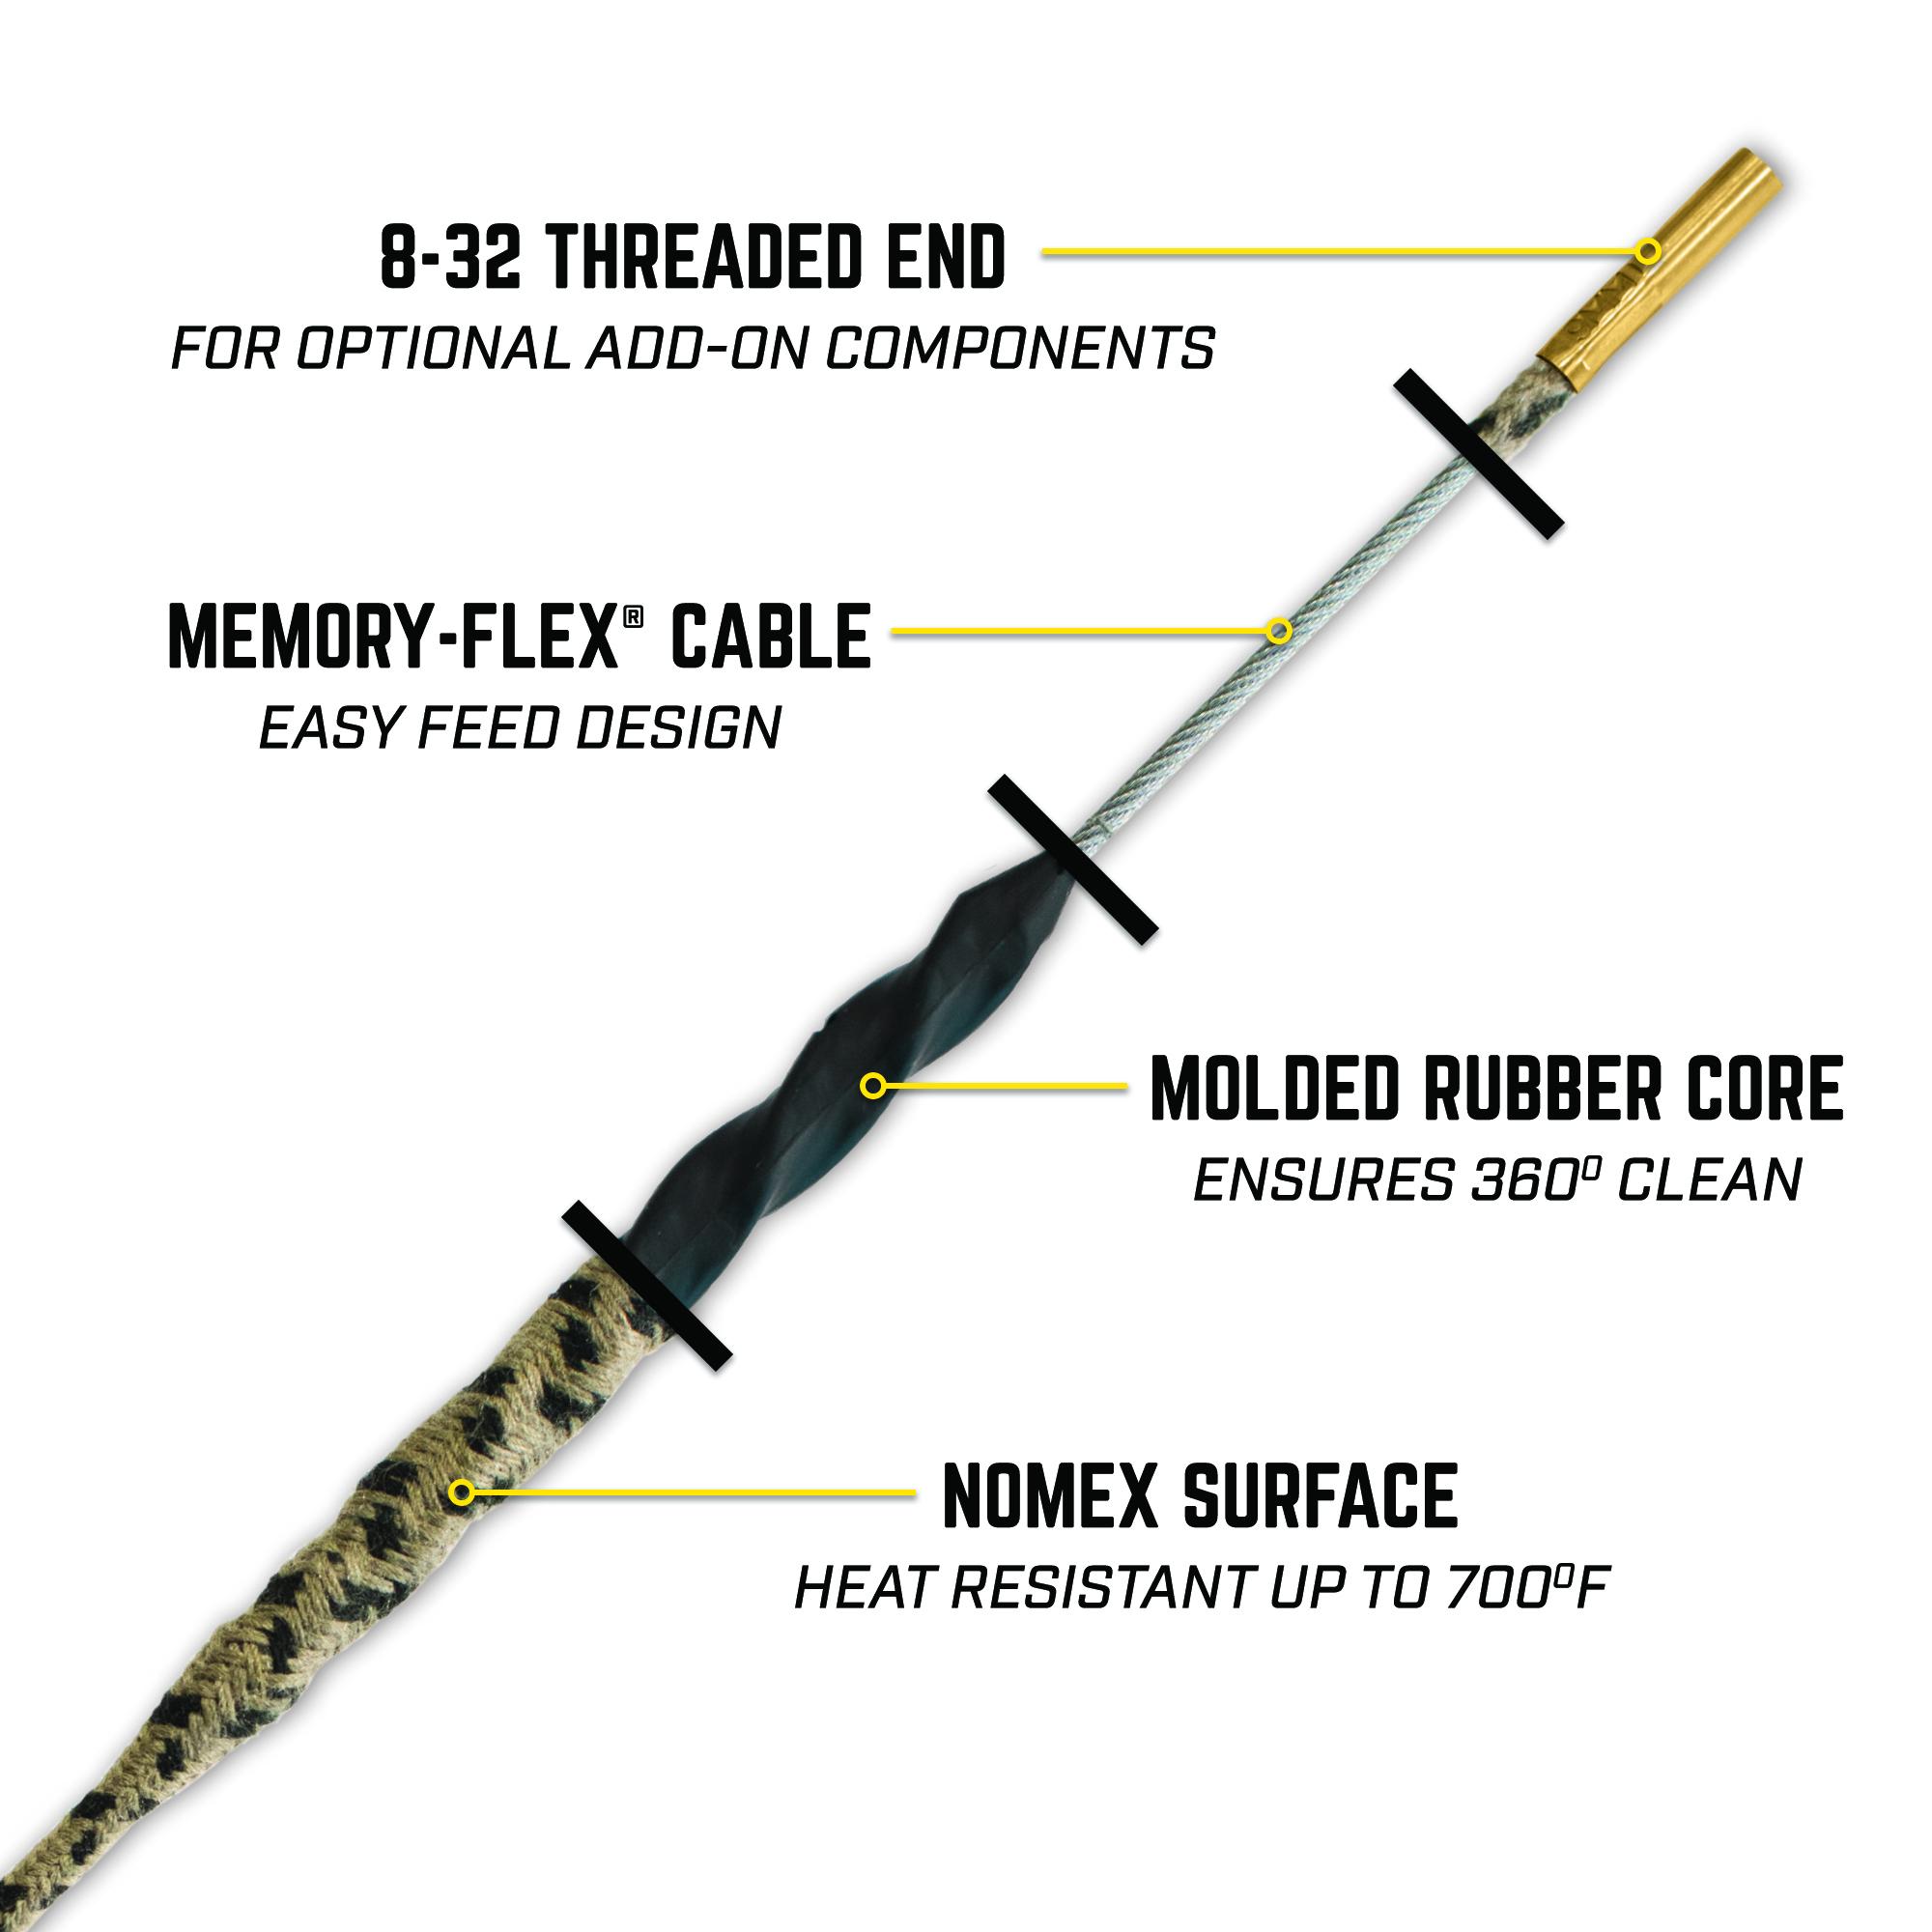 .260 cal/.264 cal/6.5mm Rifle Ripcord®